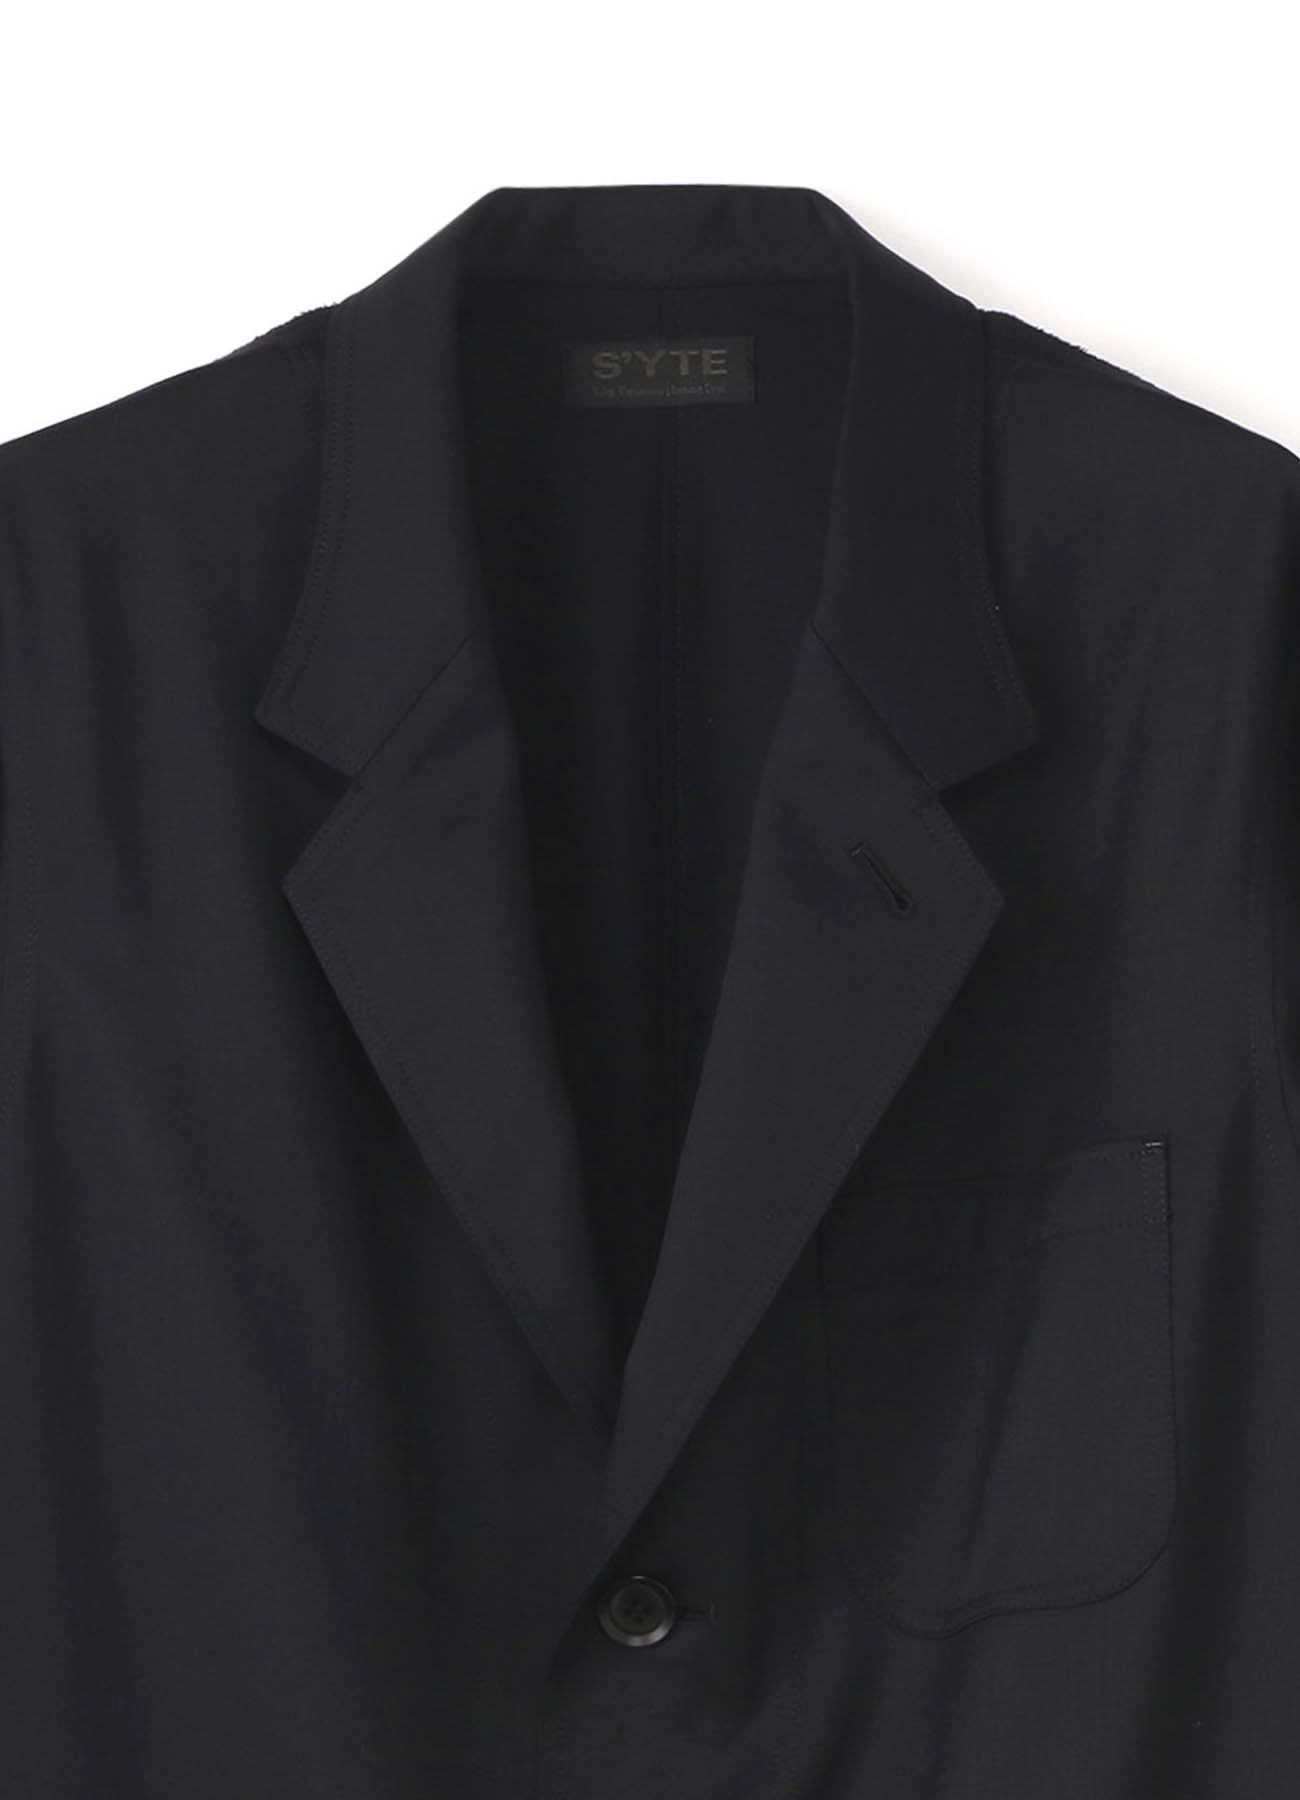 T/W Twill 3BS Tailored Shirt Jacket